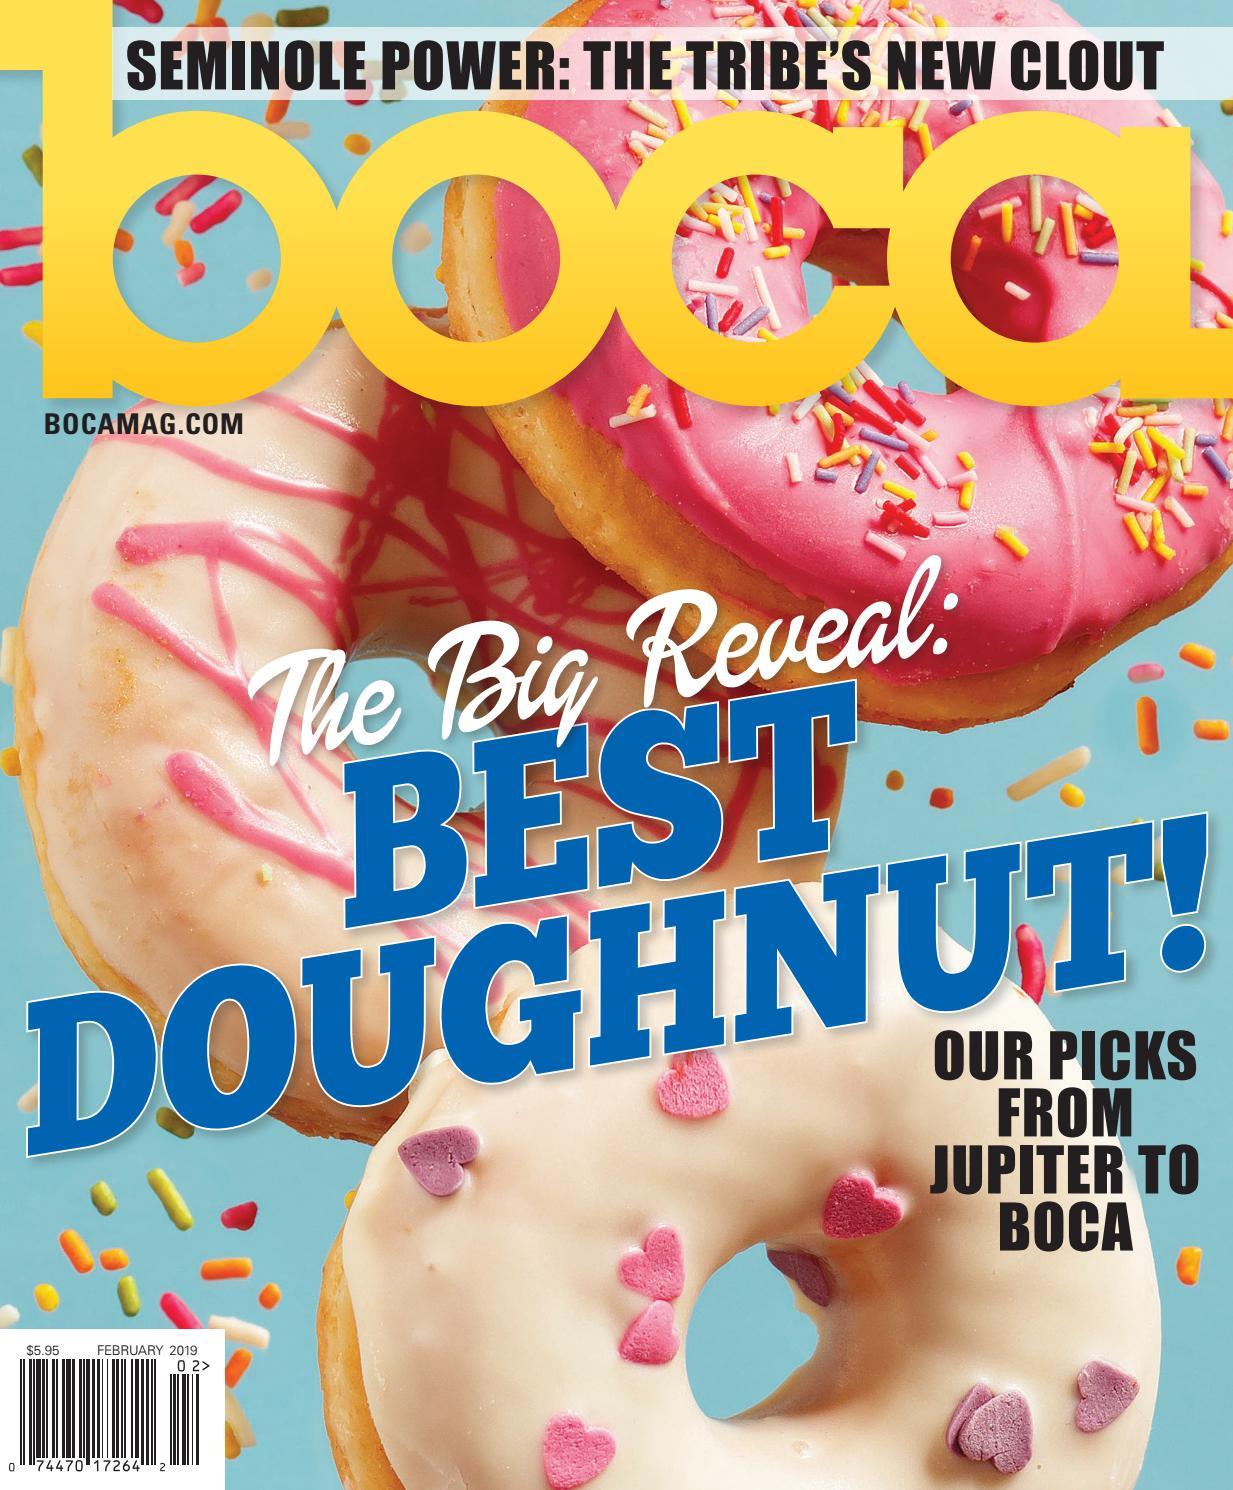 Boca Magazine February 2019 by JES Media - issuu a6d9cb8d2